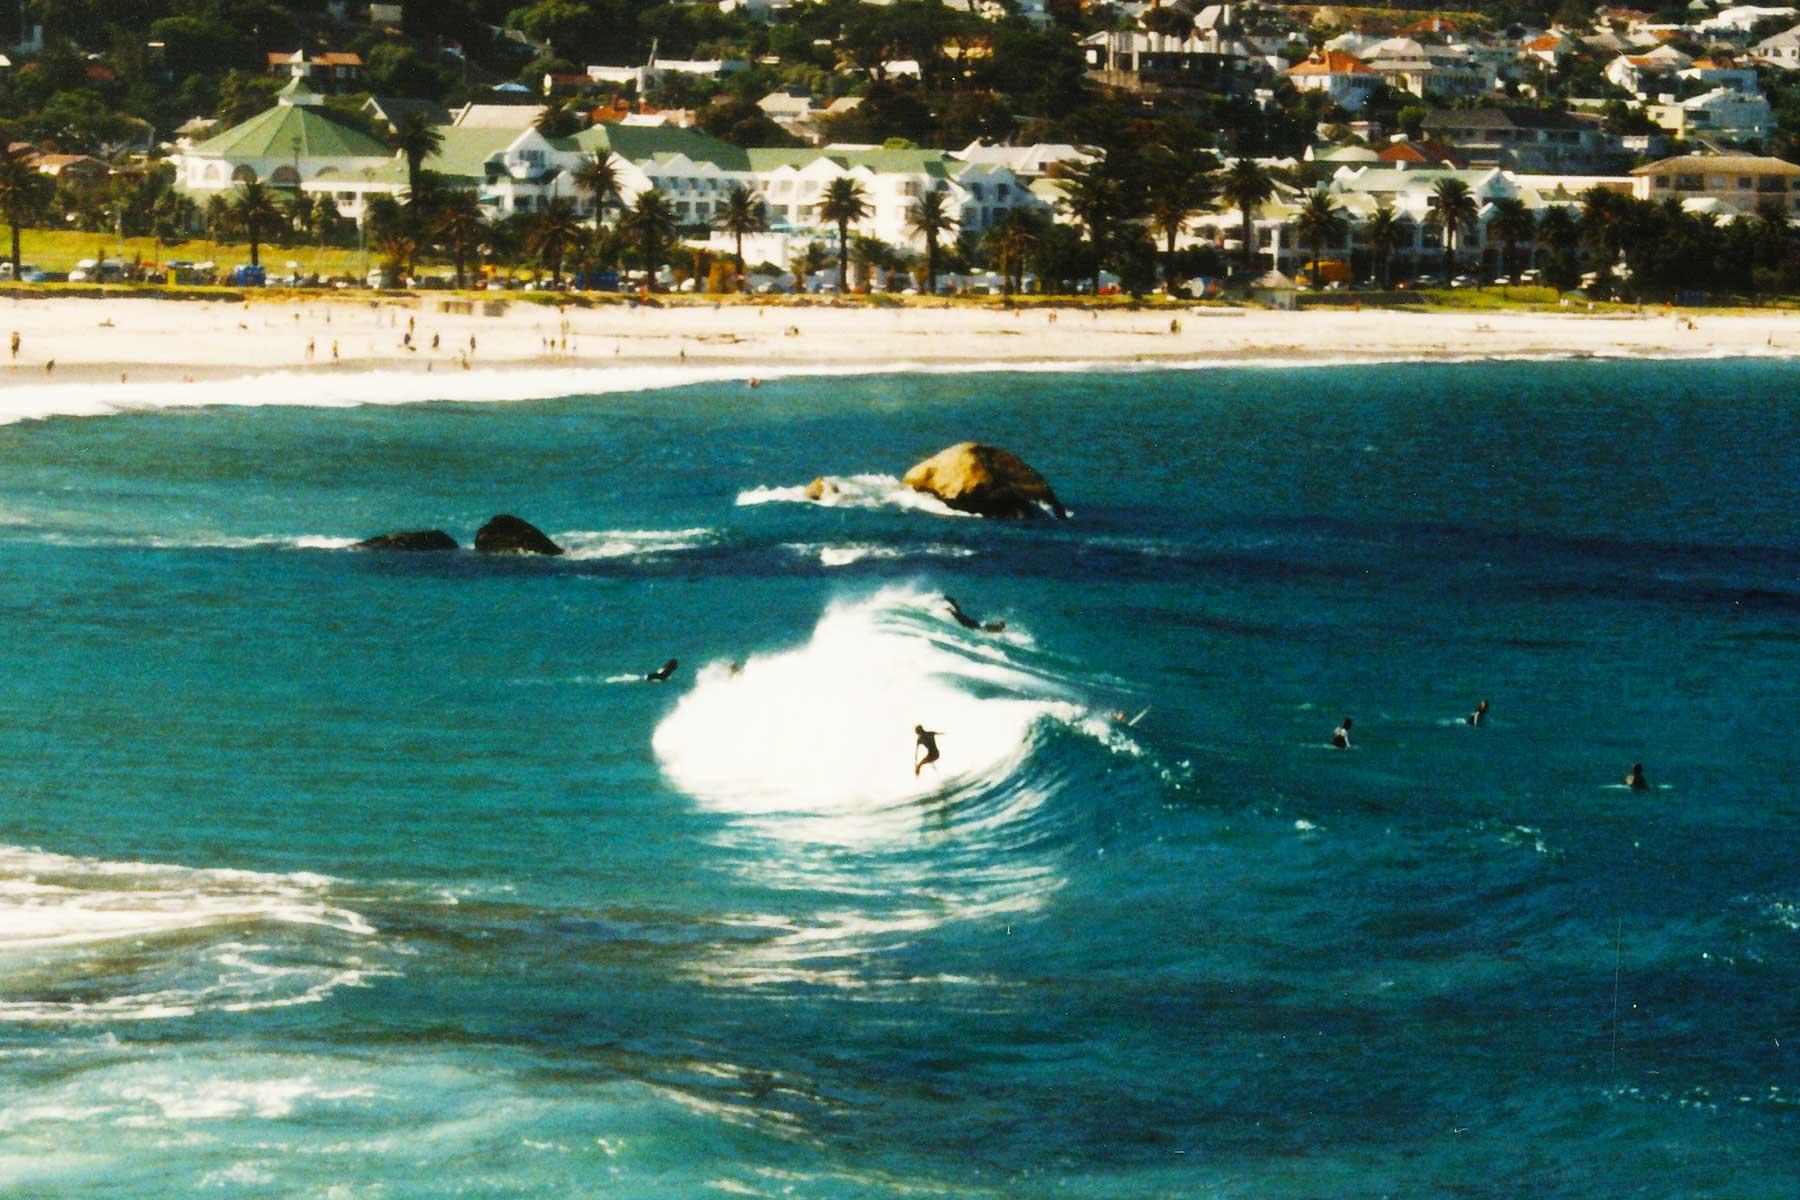 Surfer | Glen Beach | Cape Town South Africa | Steven Andrew Martin PhD | Surf Tourism Research